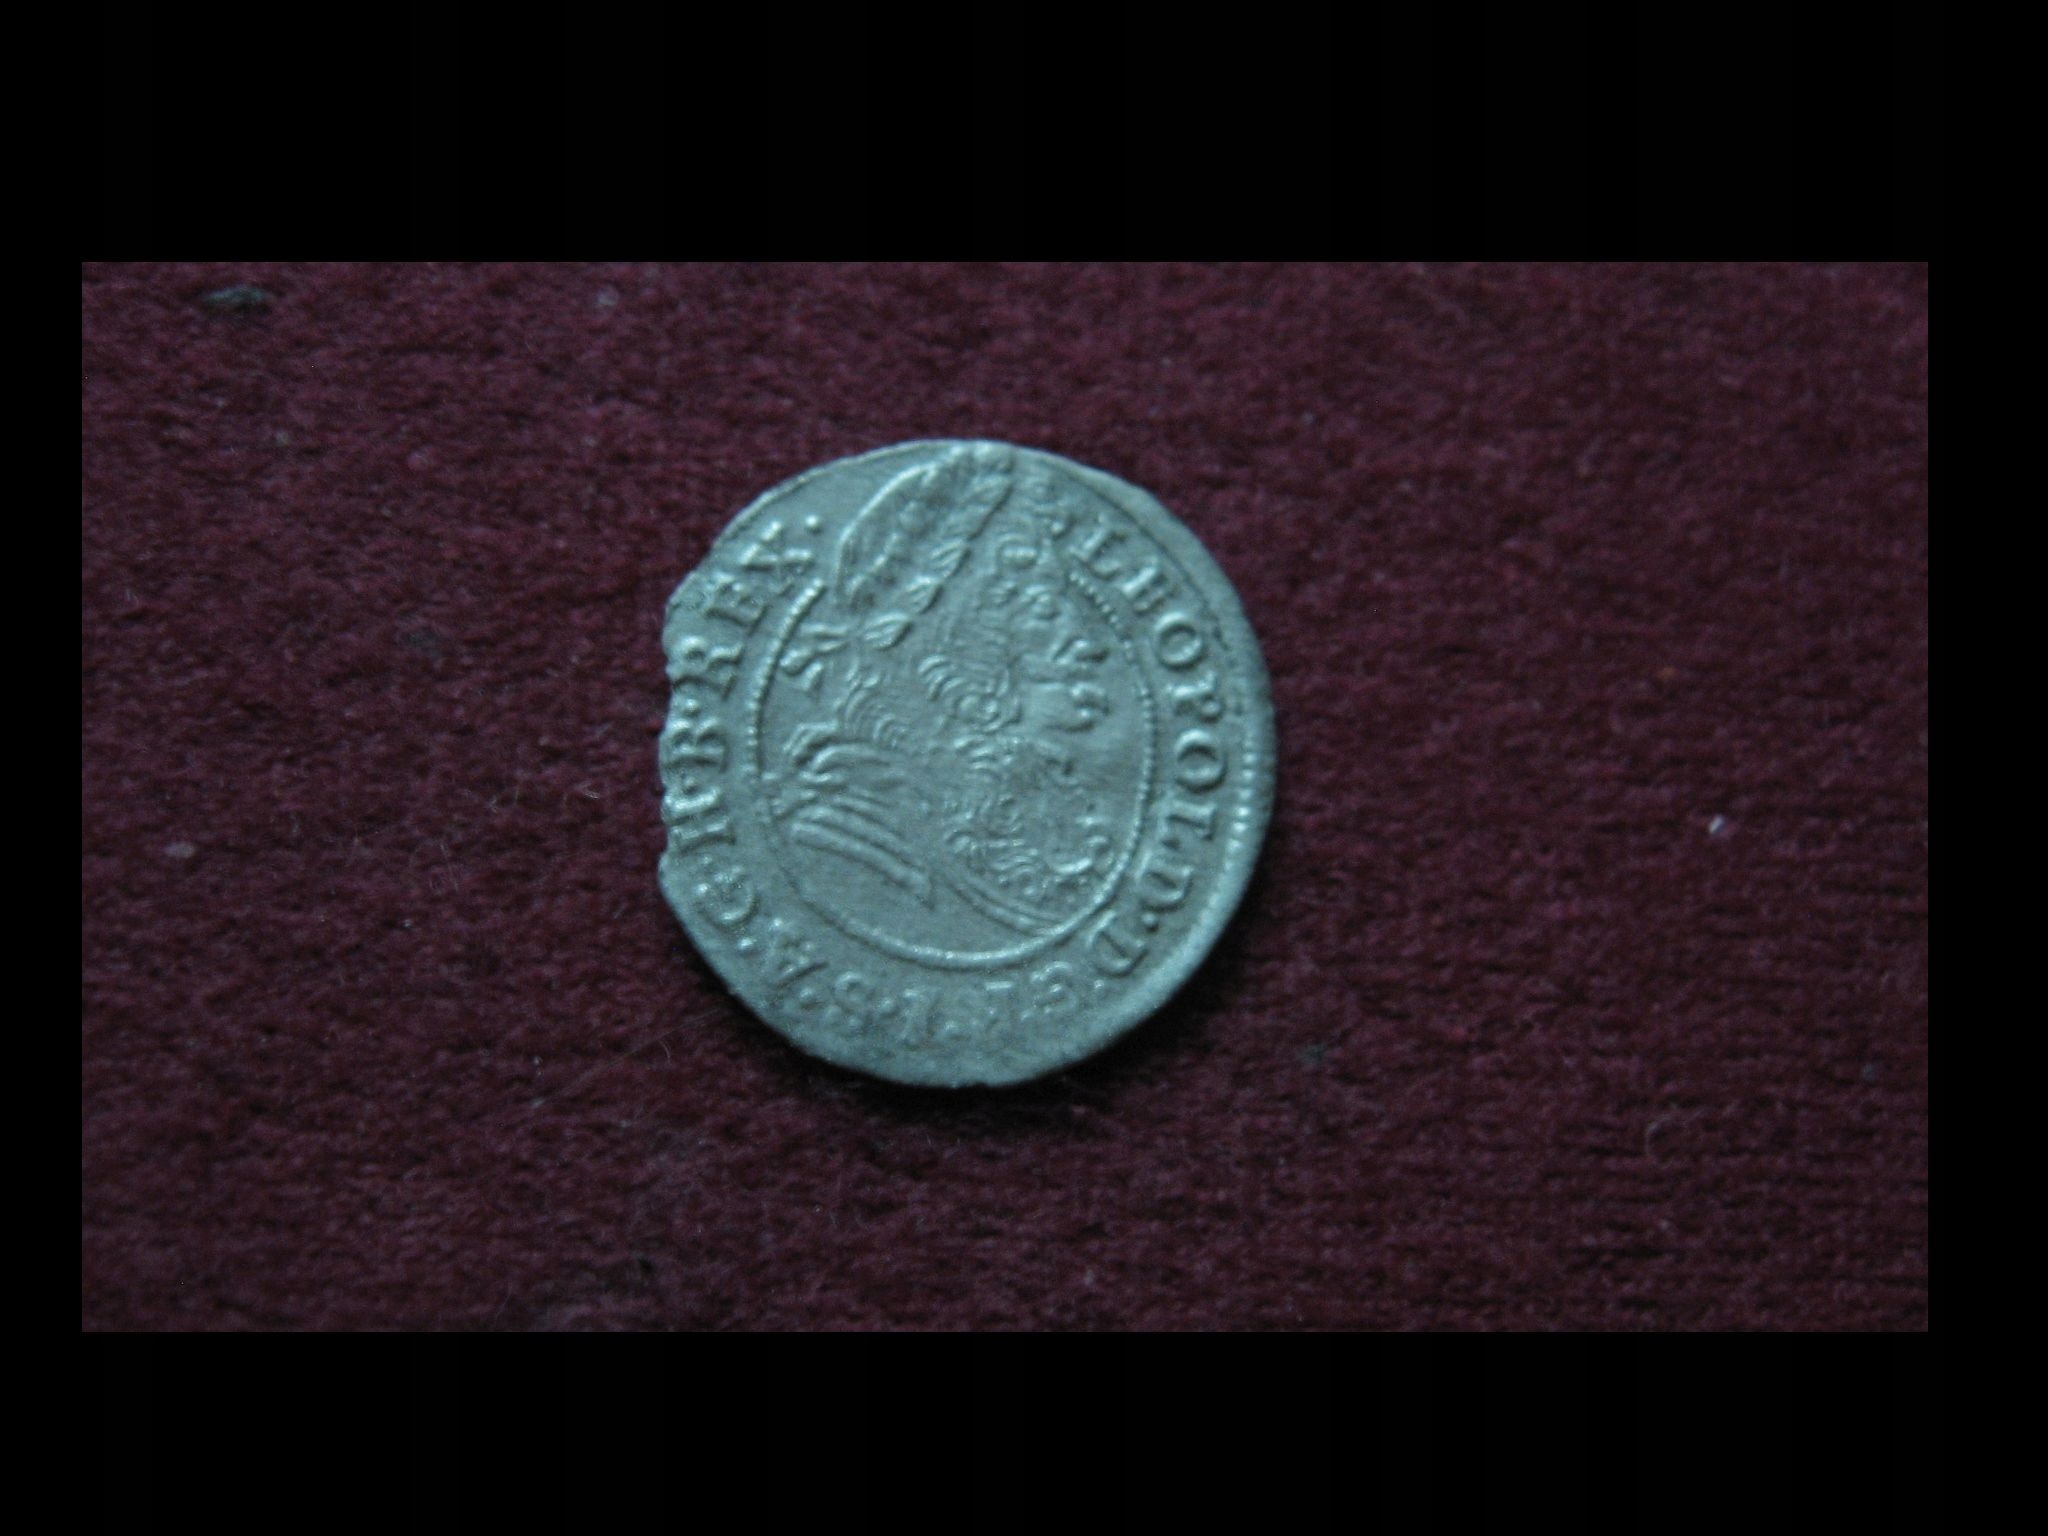 3001cdd06 AUSTRIA, LEOPOLD I(1657-1705) POLTURA 1699 - 7636101640 - oficjalne ...